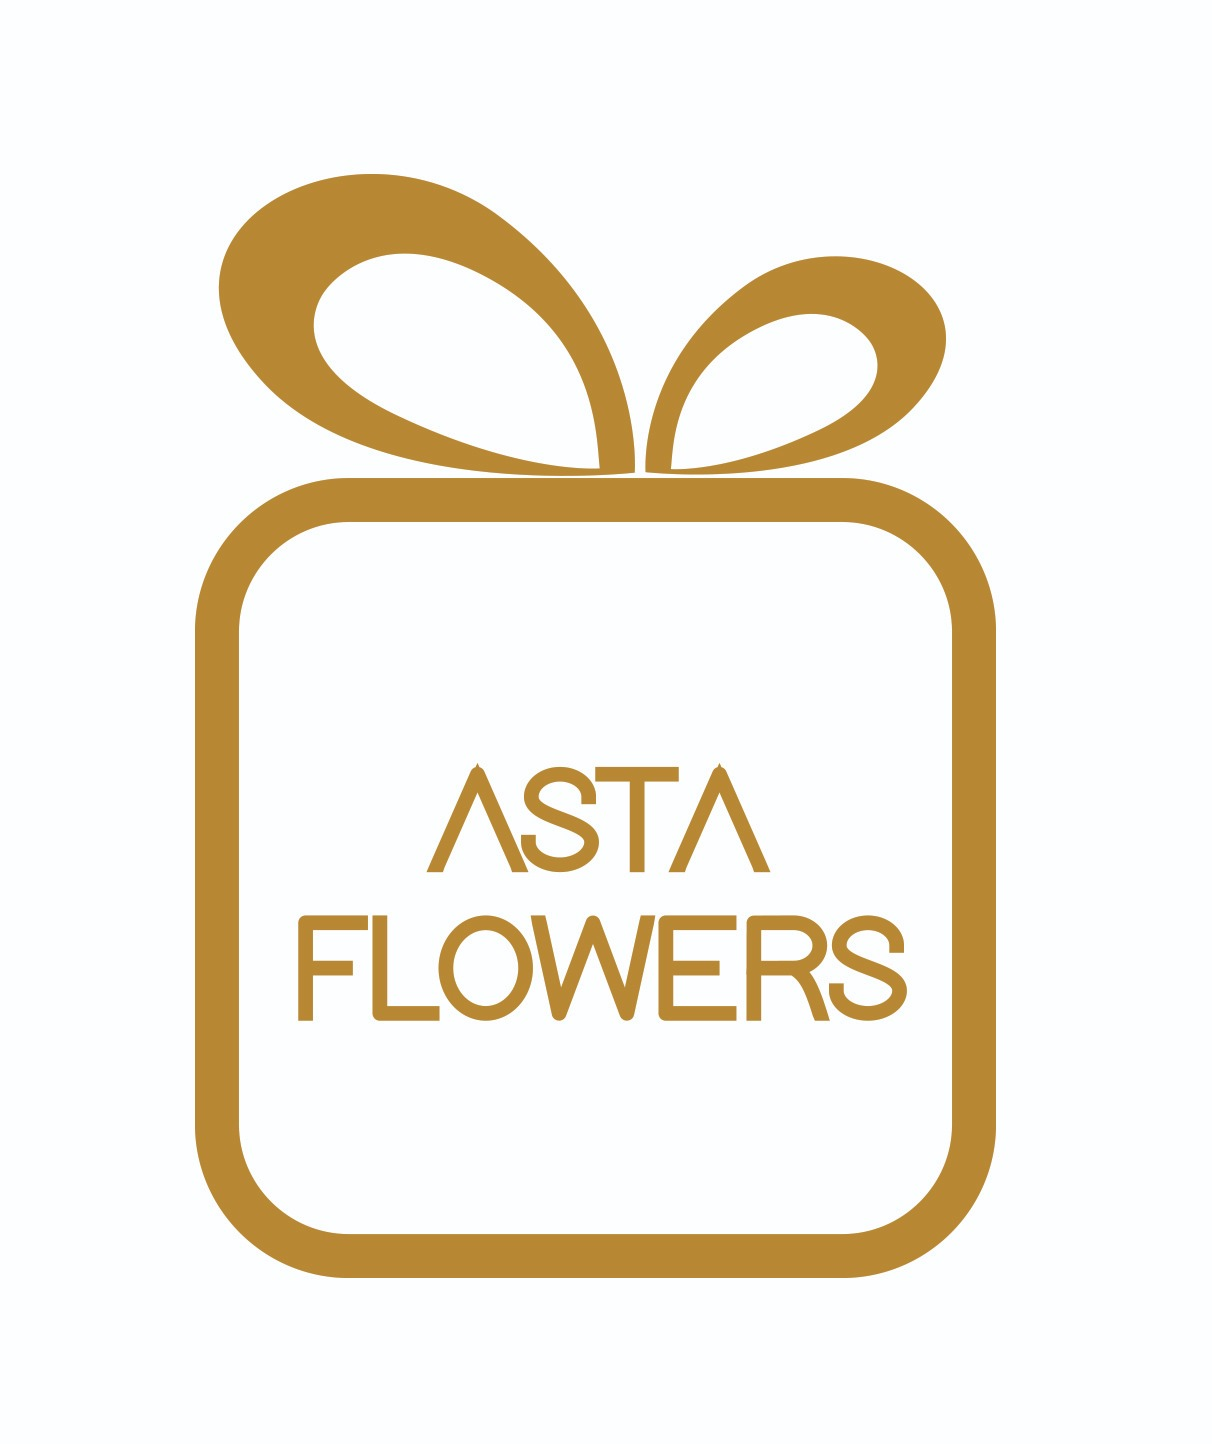 Asta Flowers